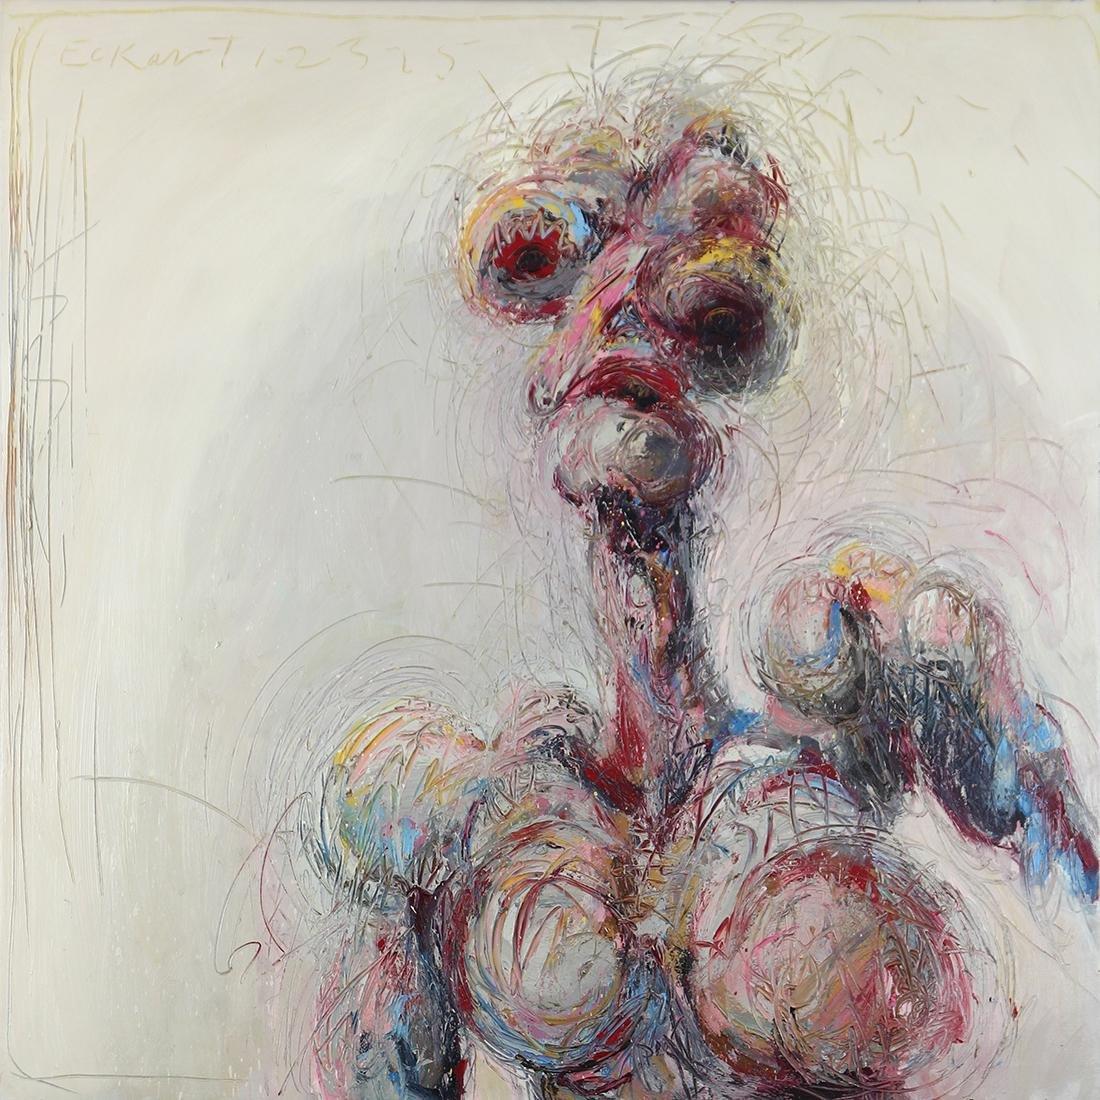 Painting, Charles Eckart